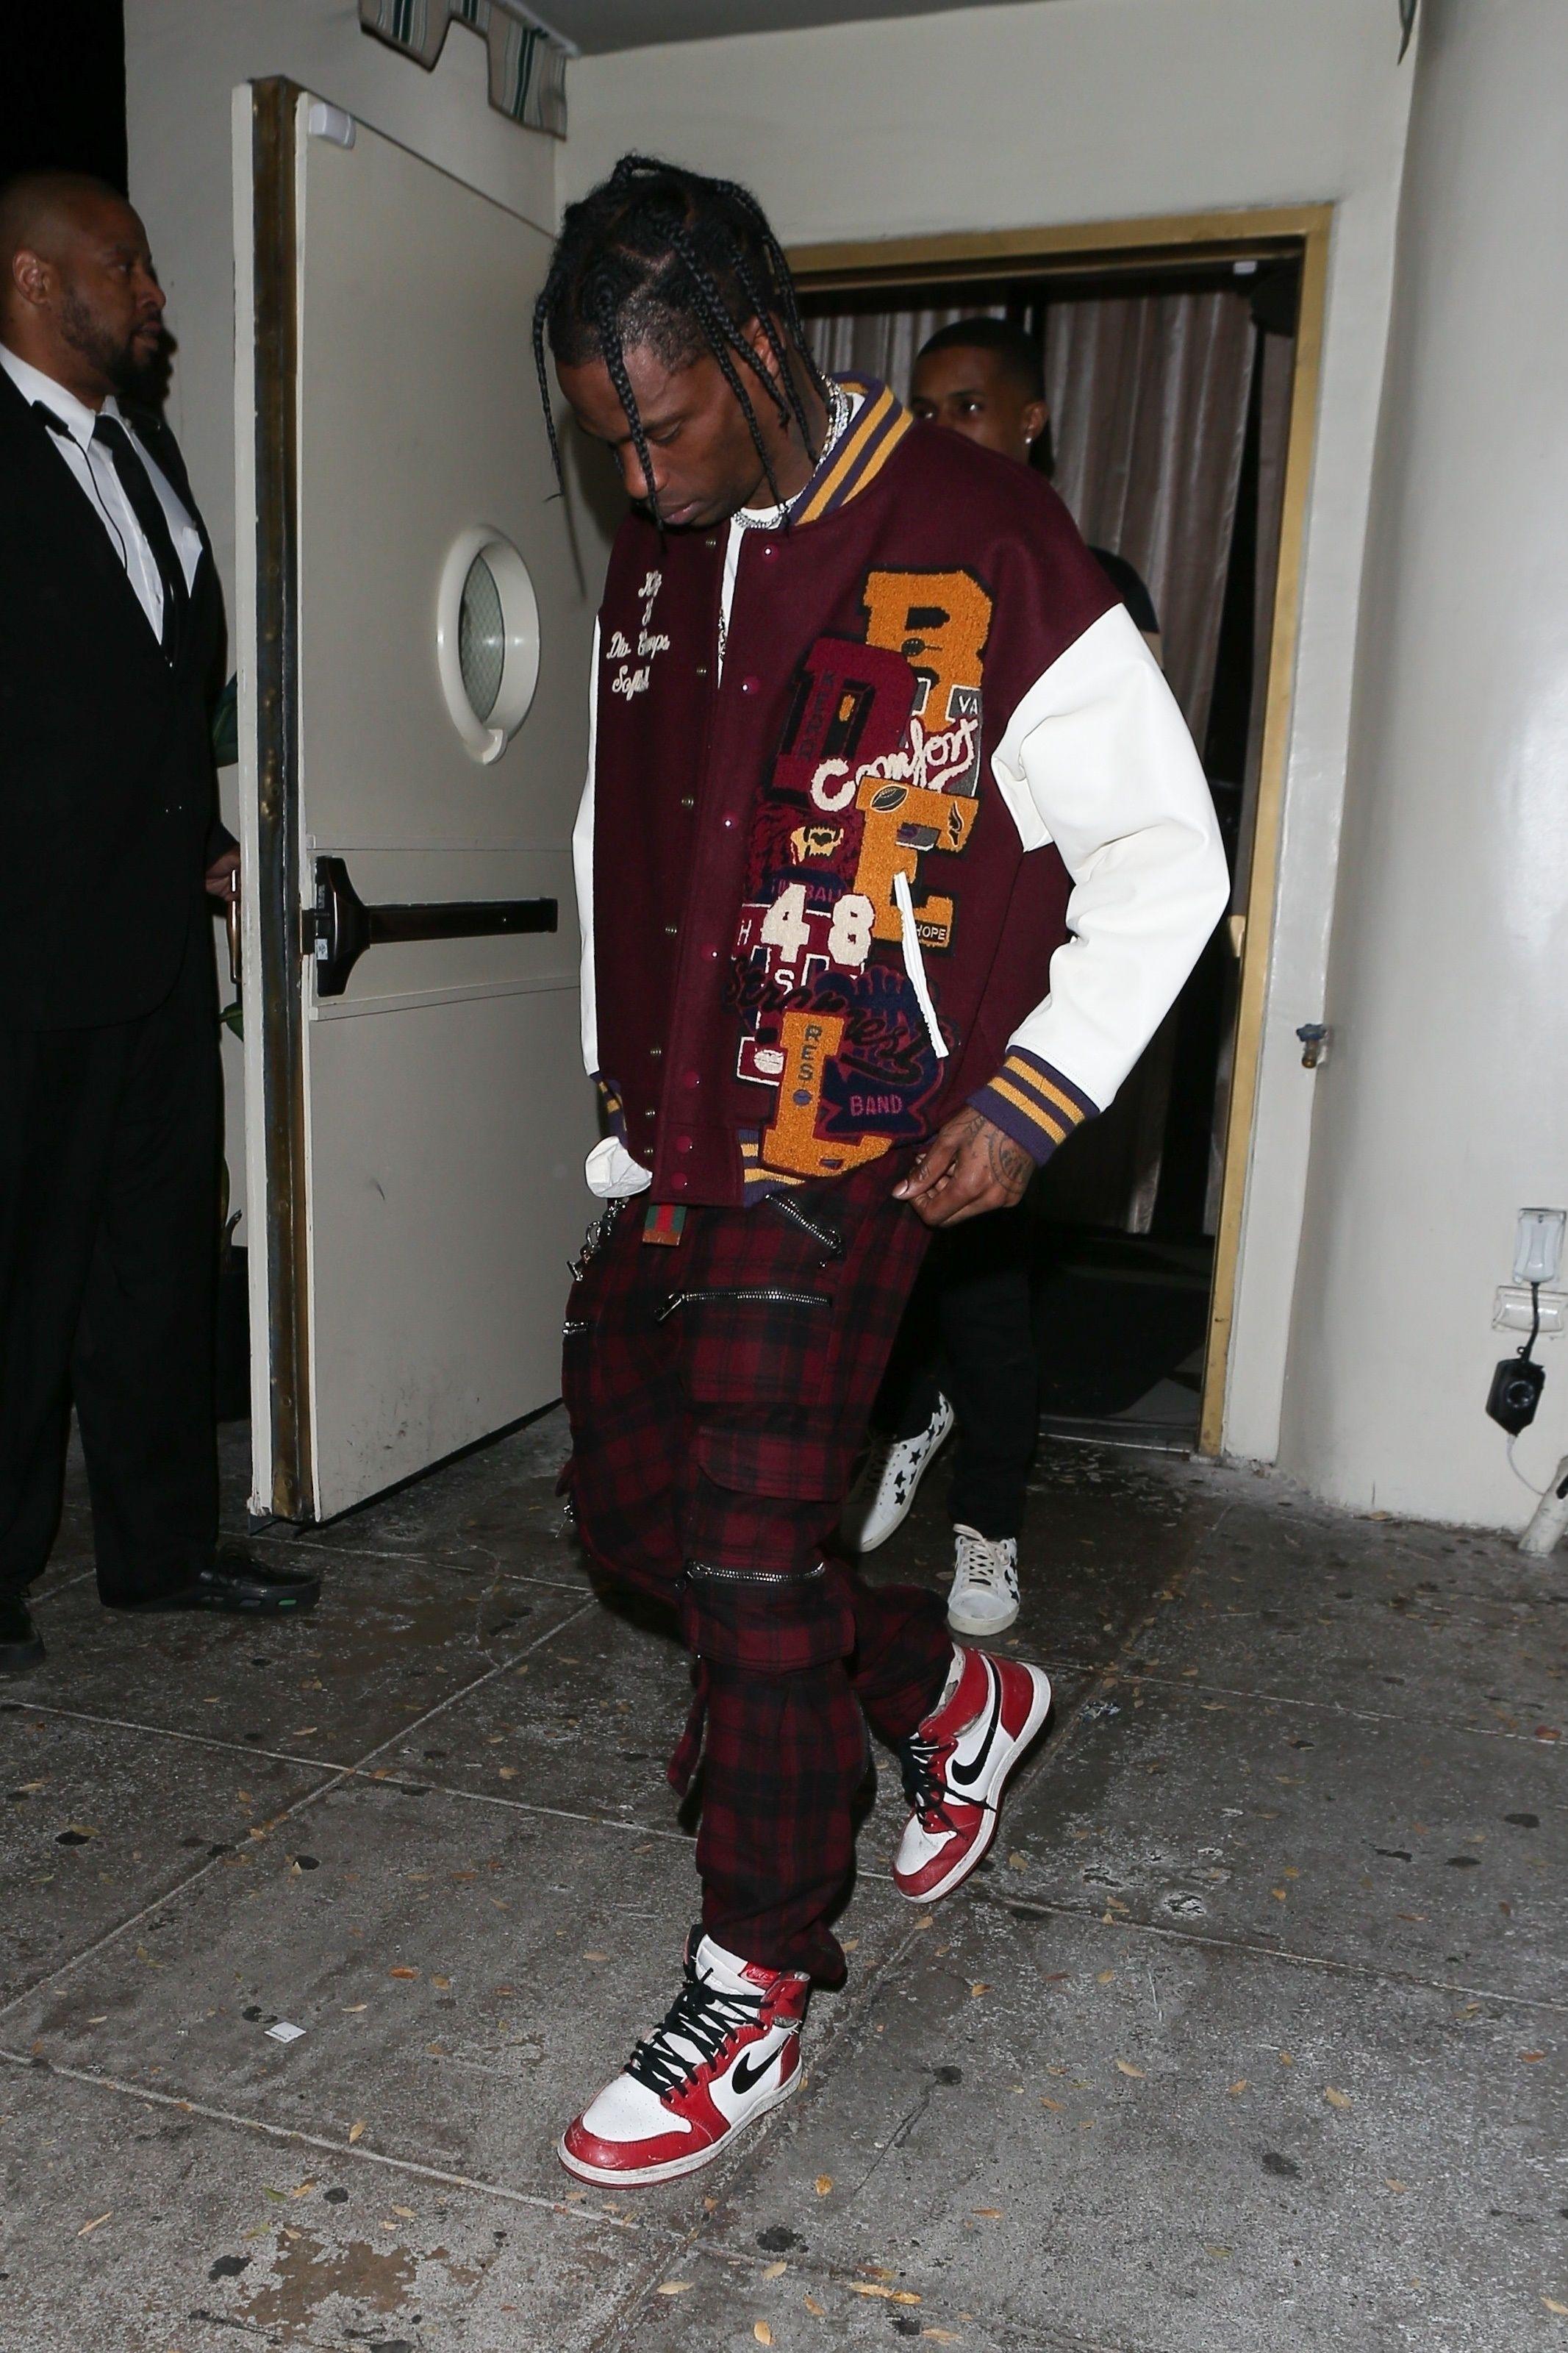 6117d4fb0250af Travis Scott wearing Doublet  Chaos  Embroidery Letterman Jacket